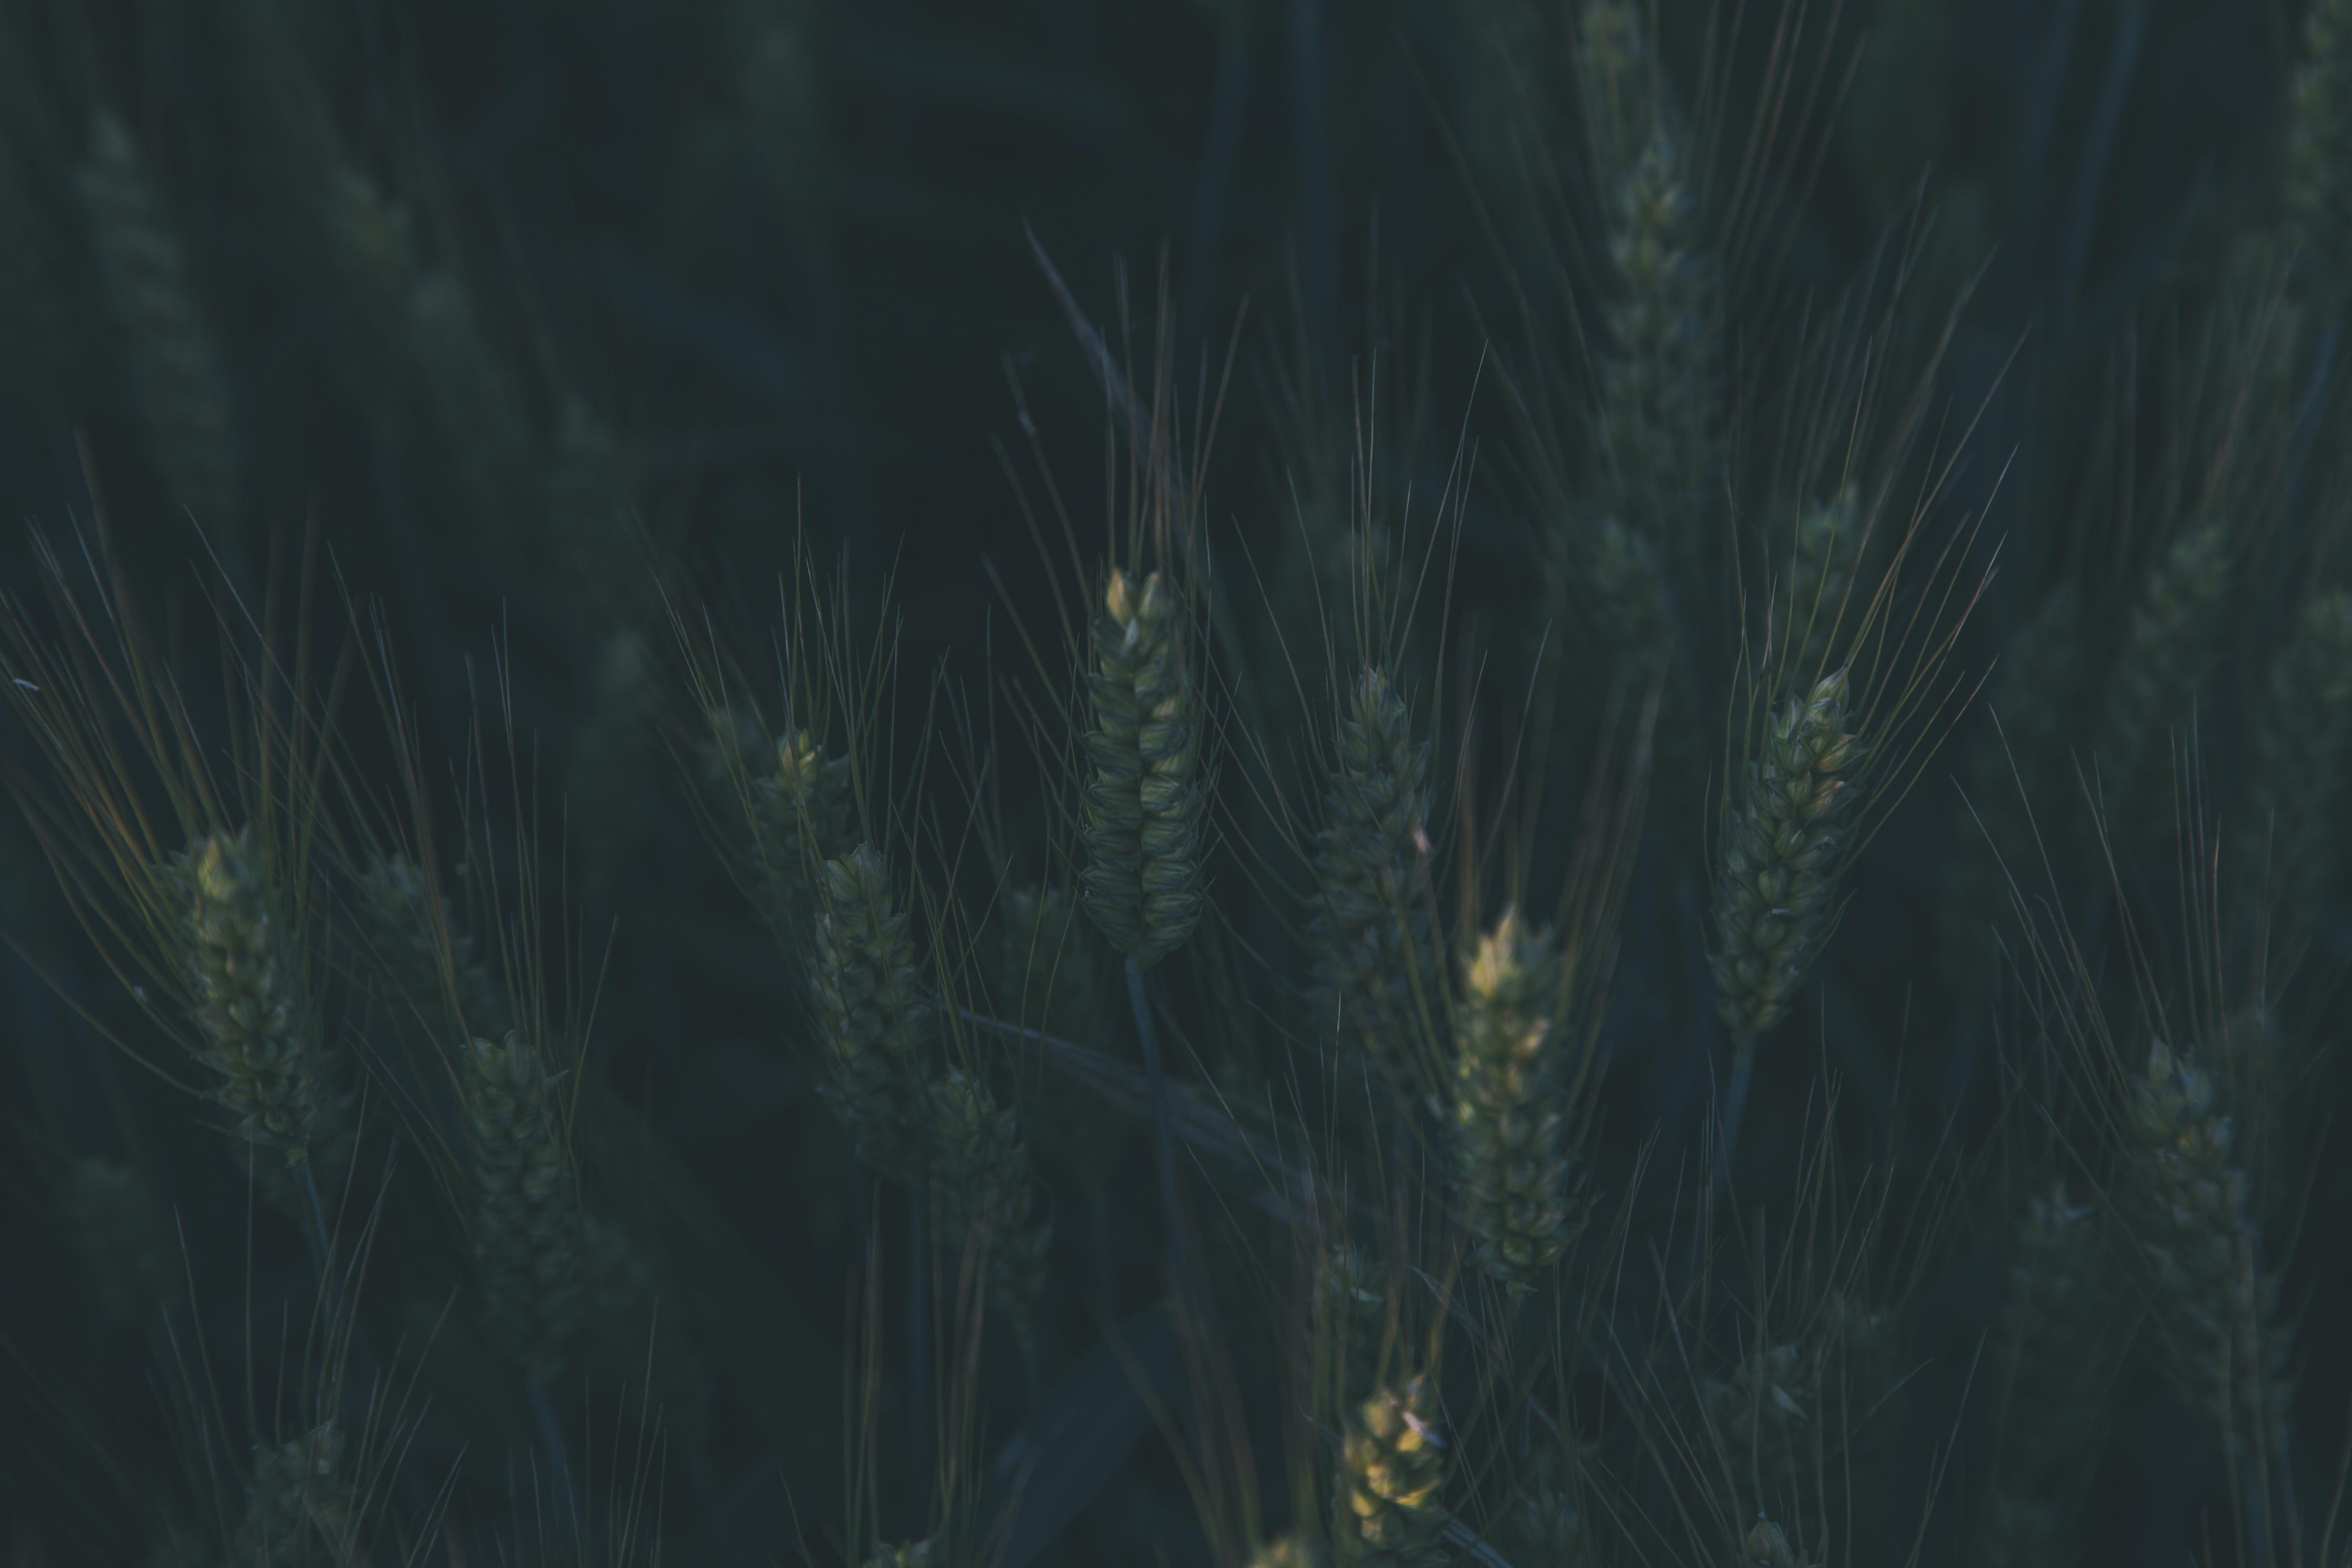 beskära, bete, bondgård